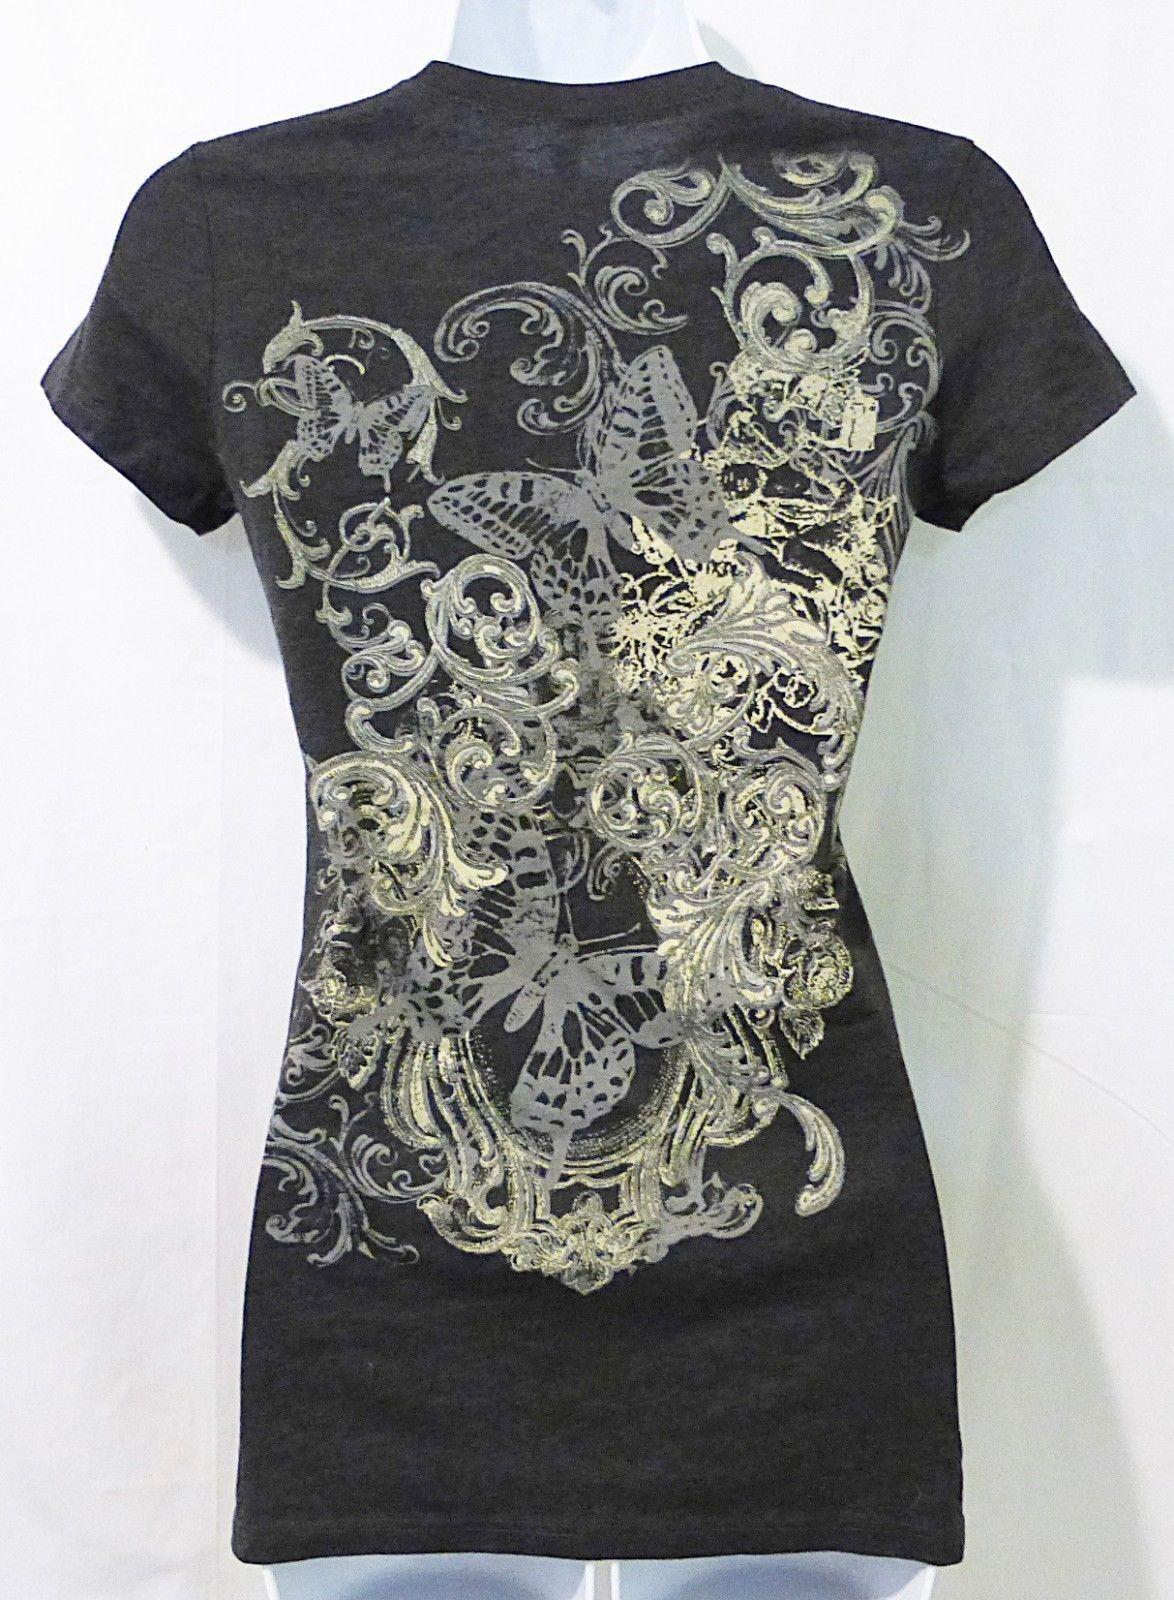 Women t-shirt short sleeve with cross print gray S-L